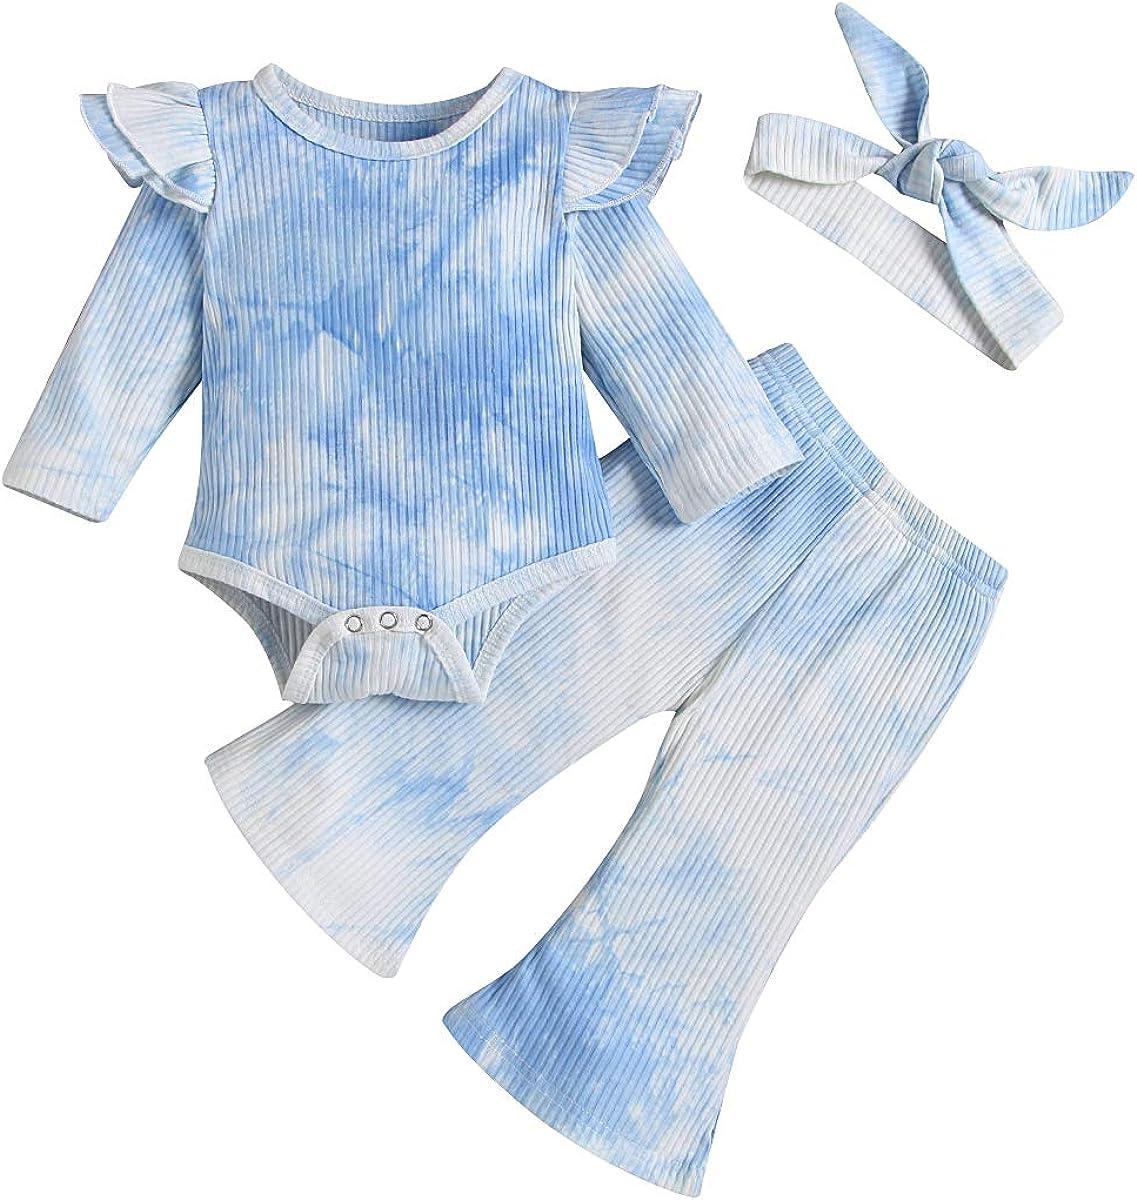 bilison Baby Girl Boy Clothes Newborn Baby Tie-Dye Ruffle Sleeve Romper Top+Long Pants Little Girl Boy Outfits